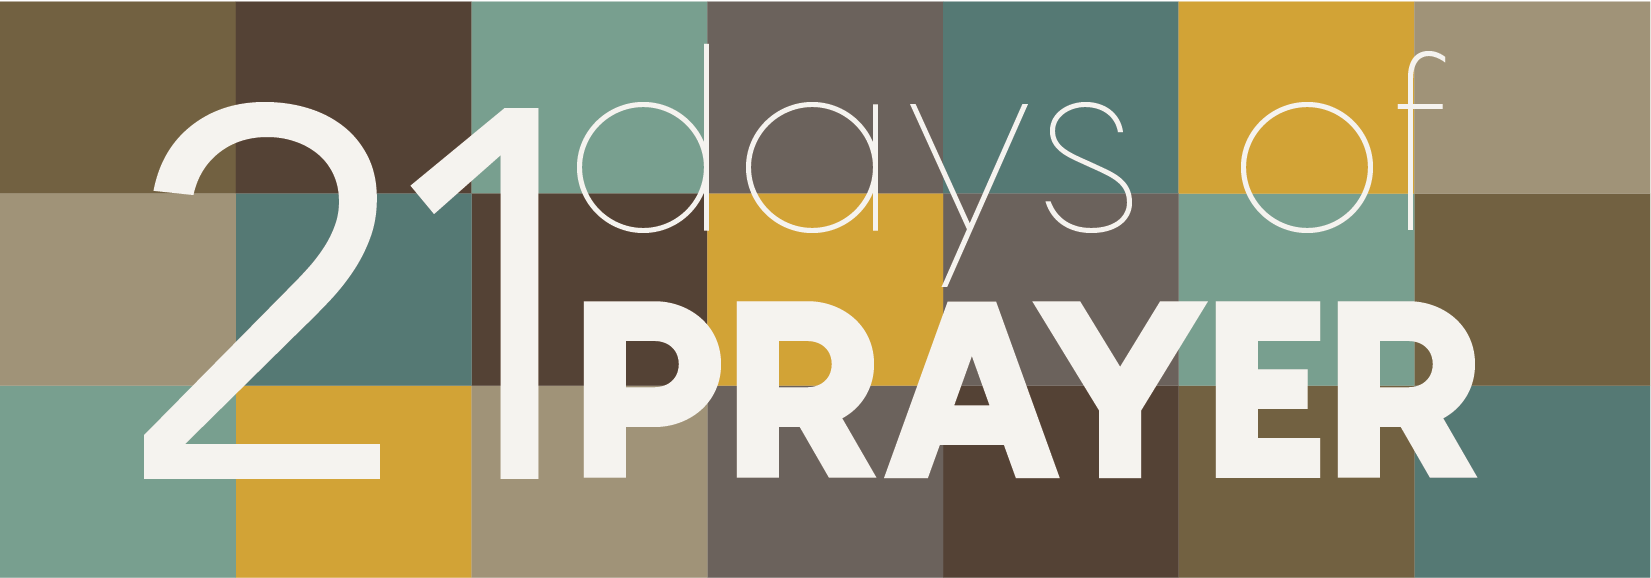 21 Days of Prayer-05.png